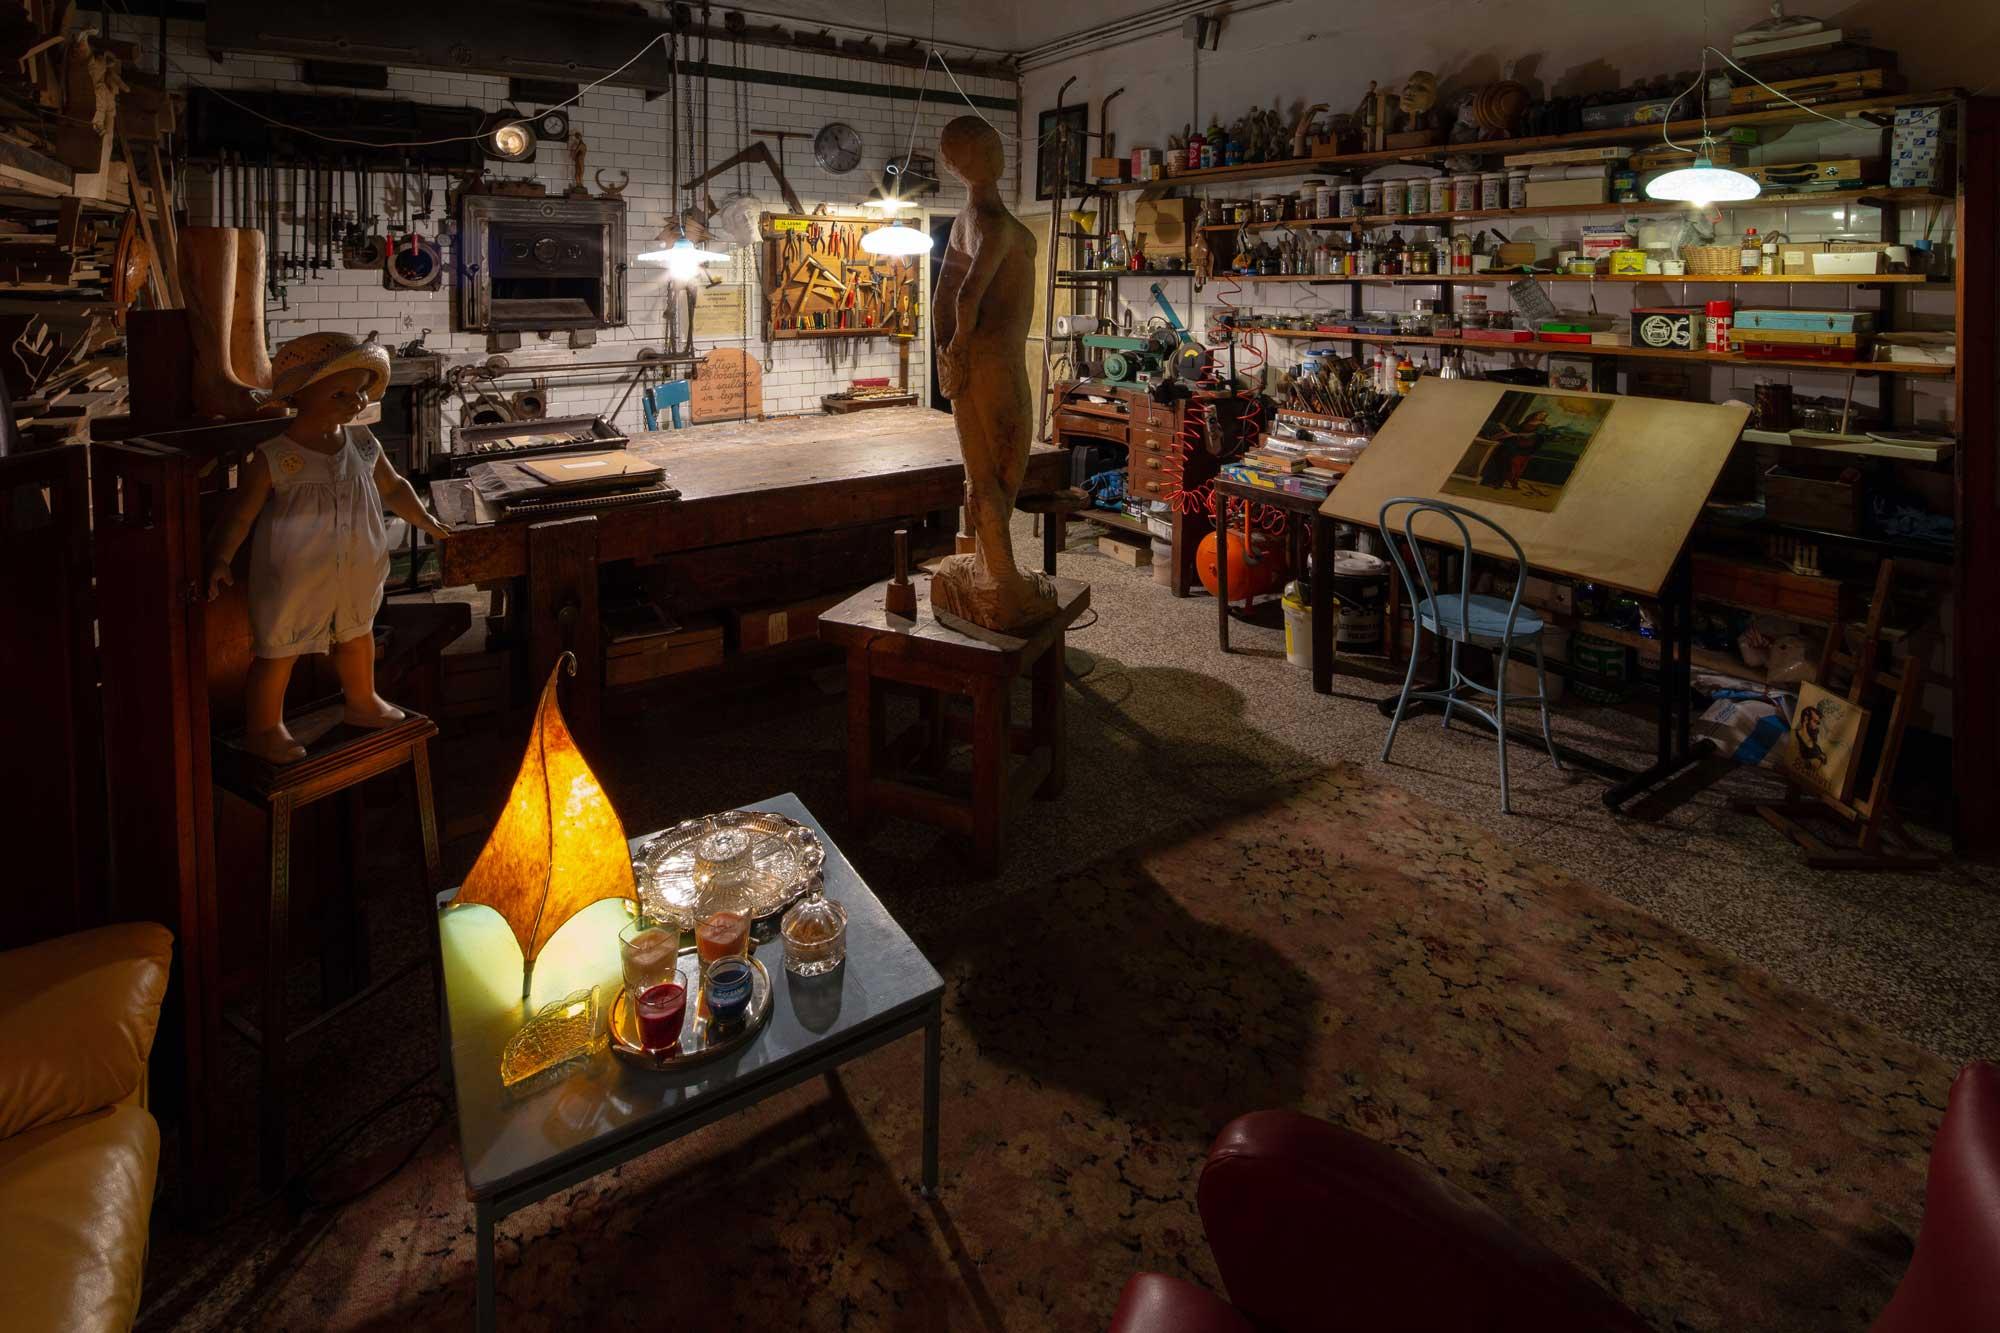 Studio di Flavia Franceschini. Foto © Andrea Bighi